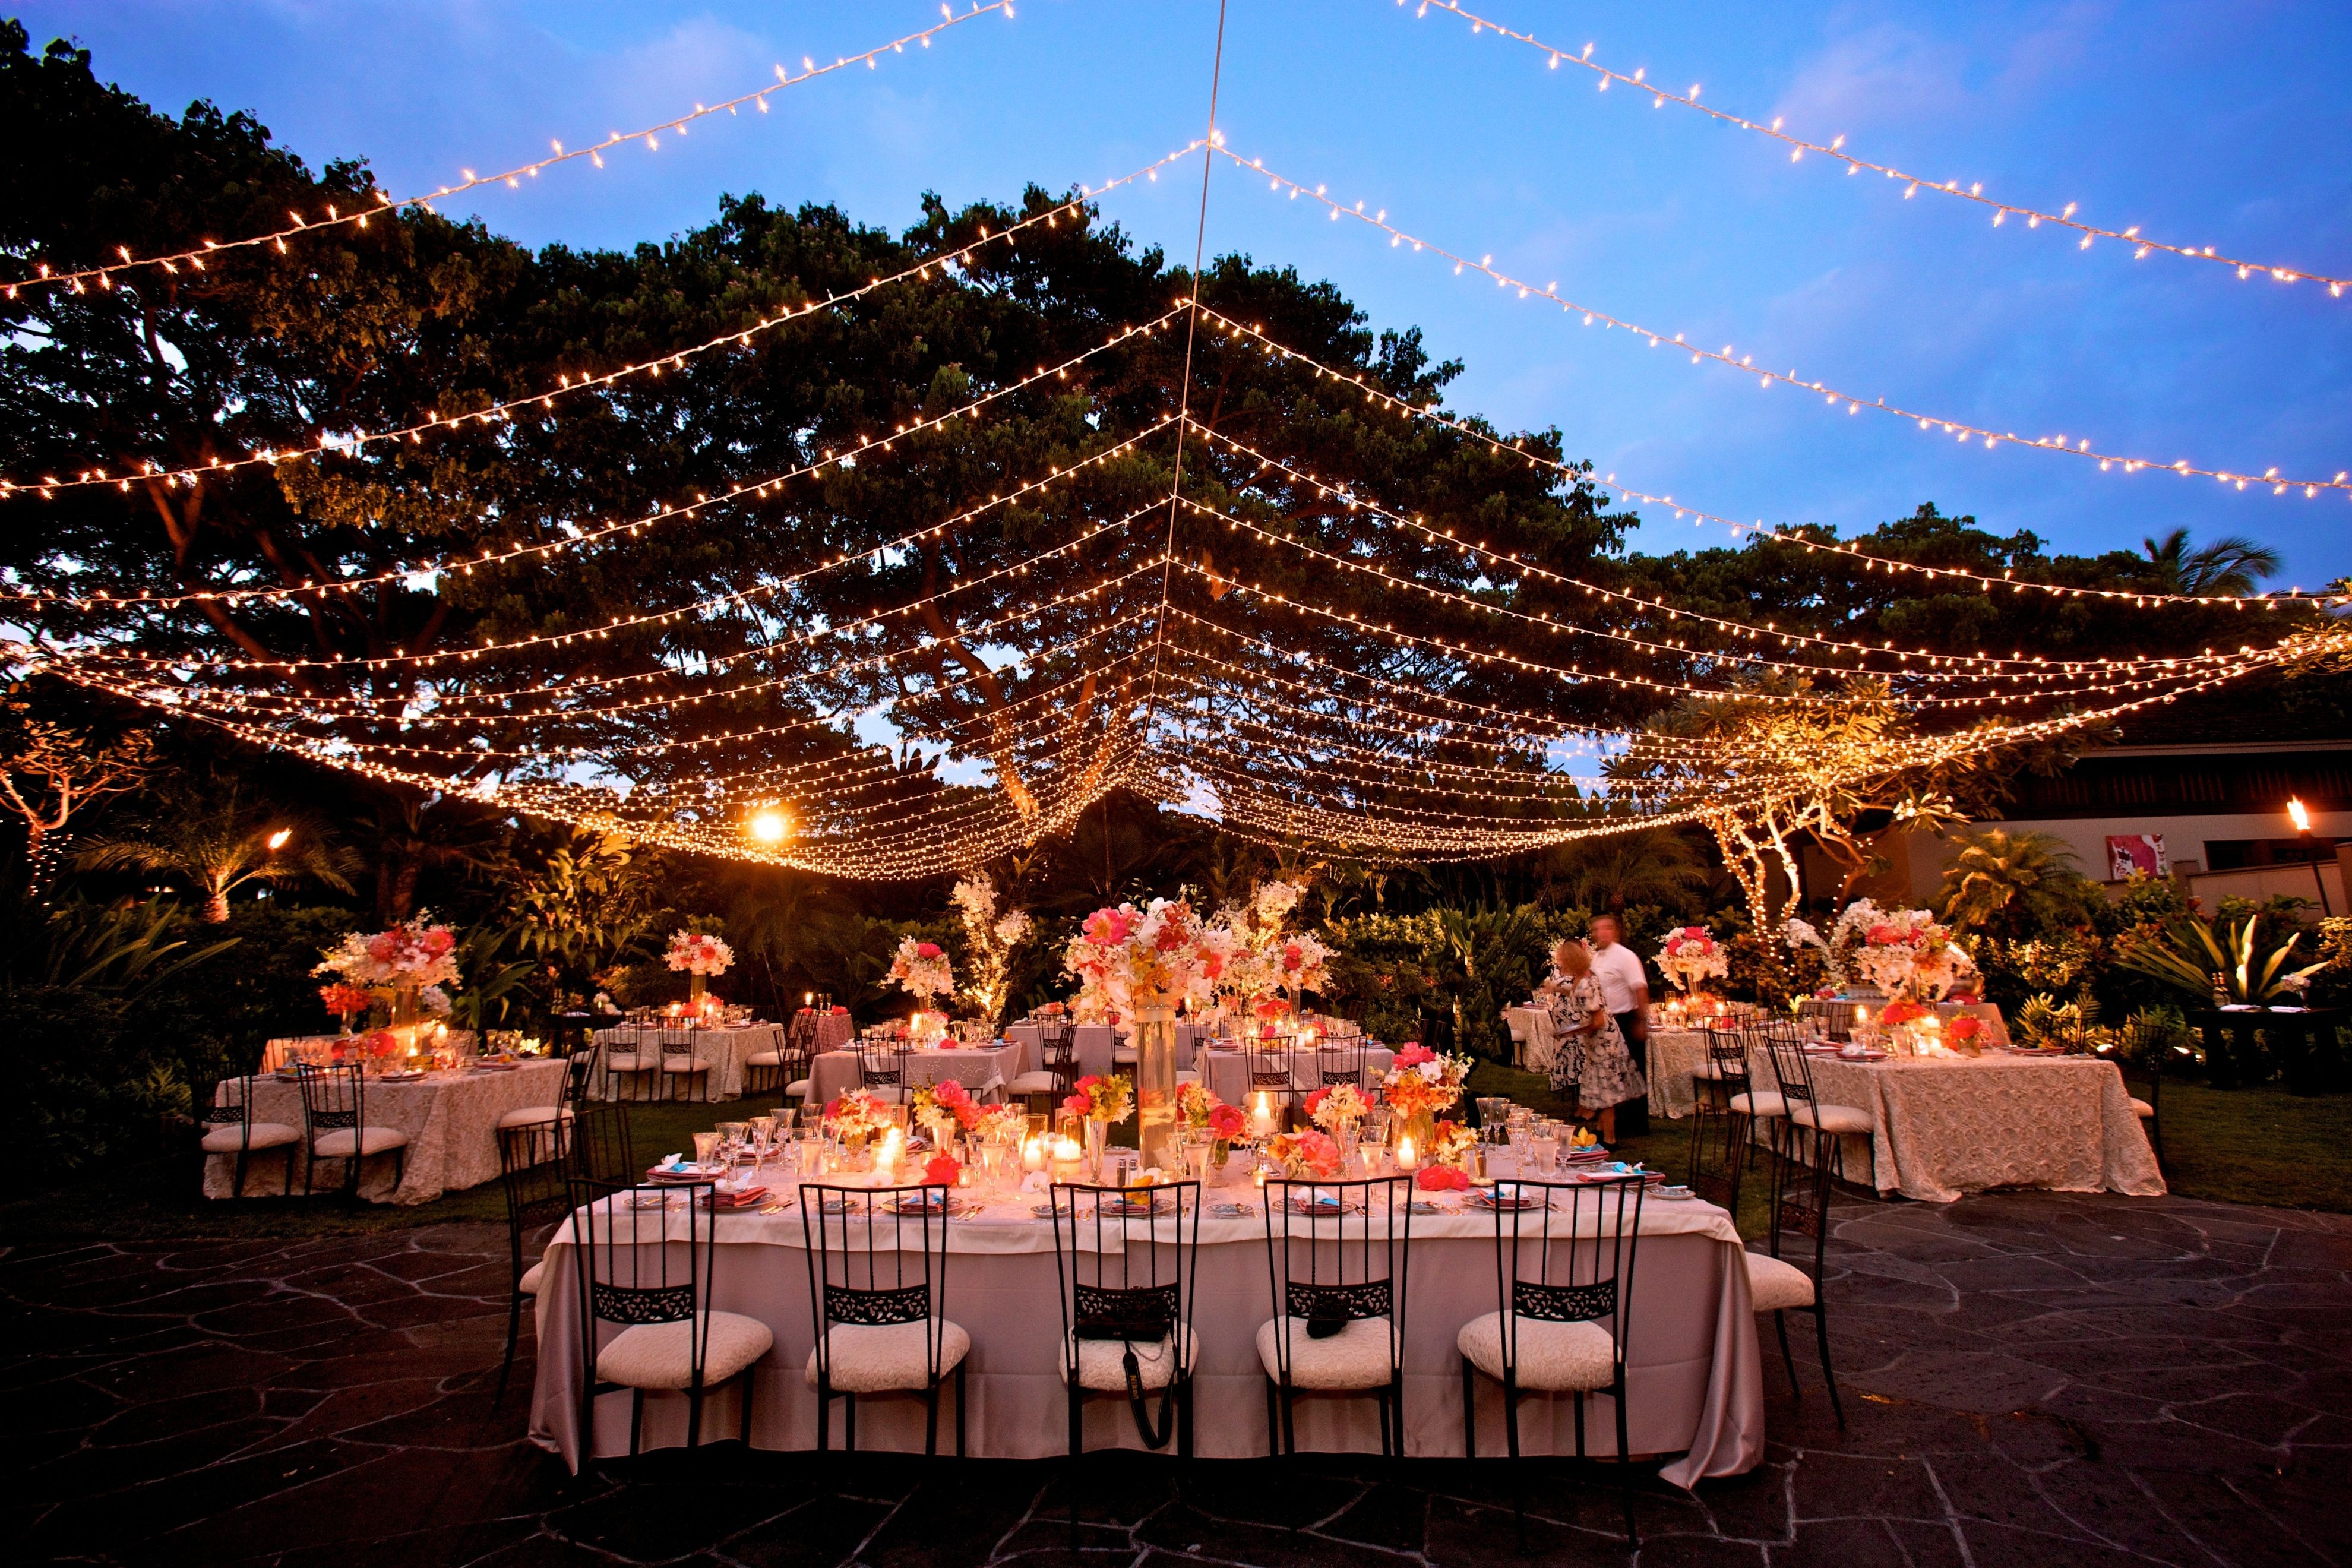 Wedding Night Garden Party Decorations